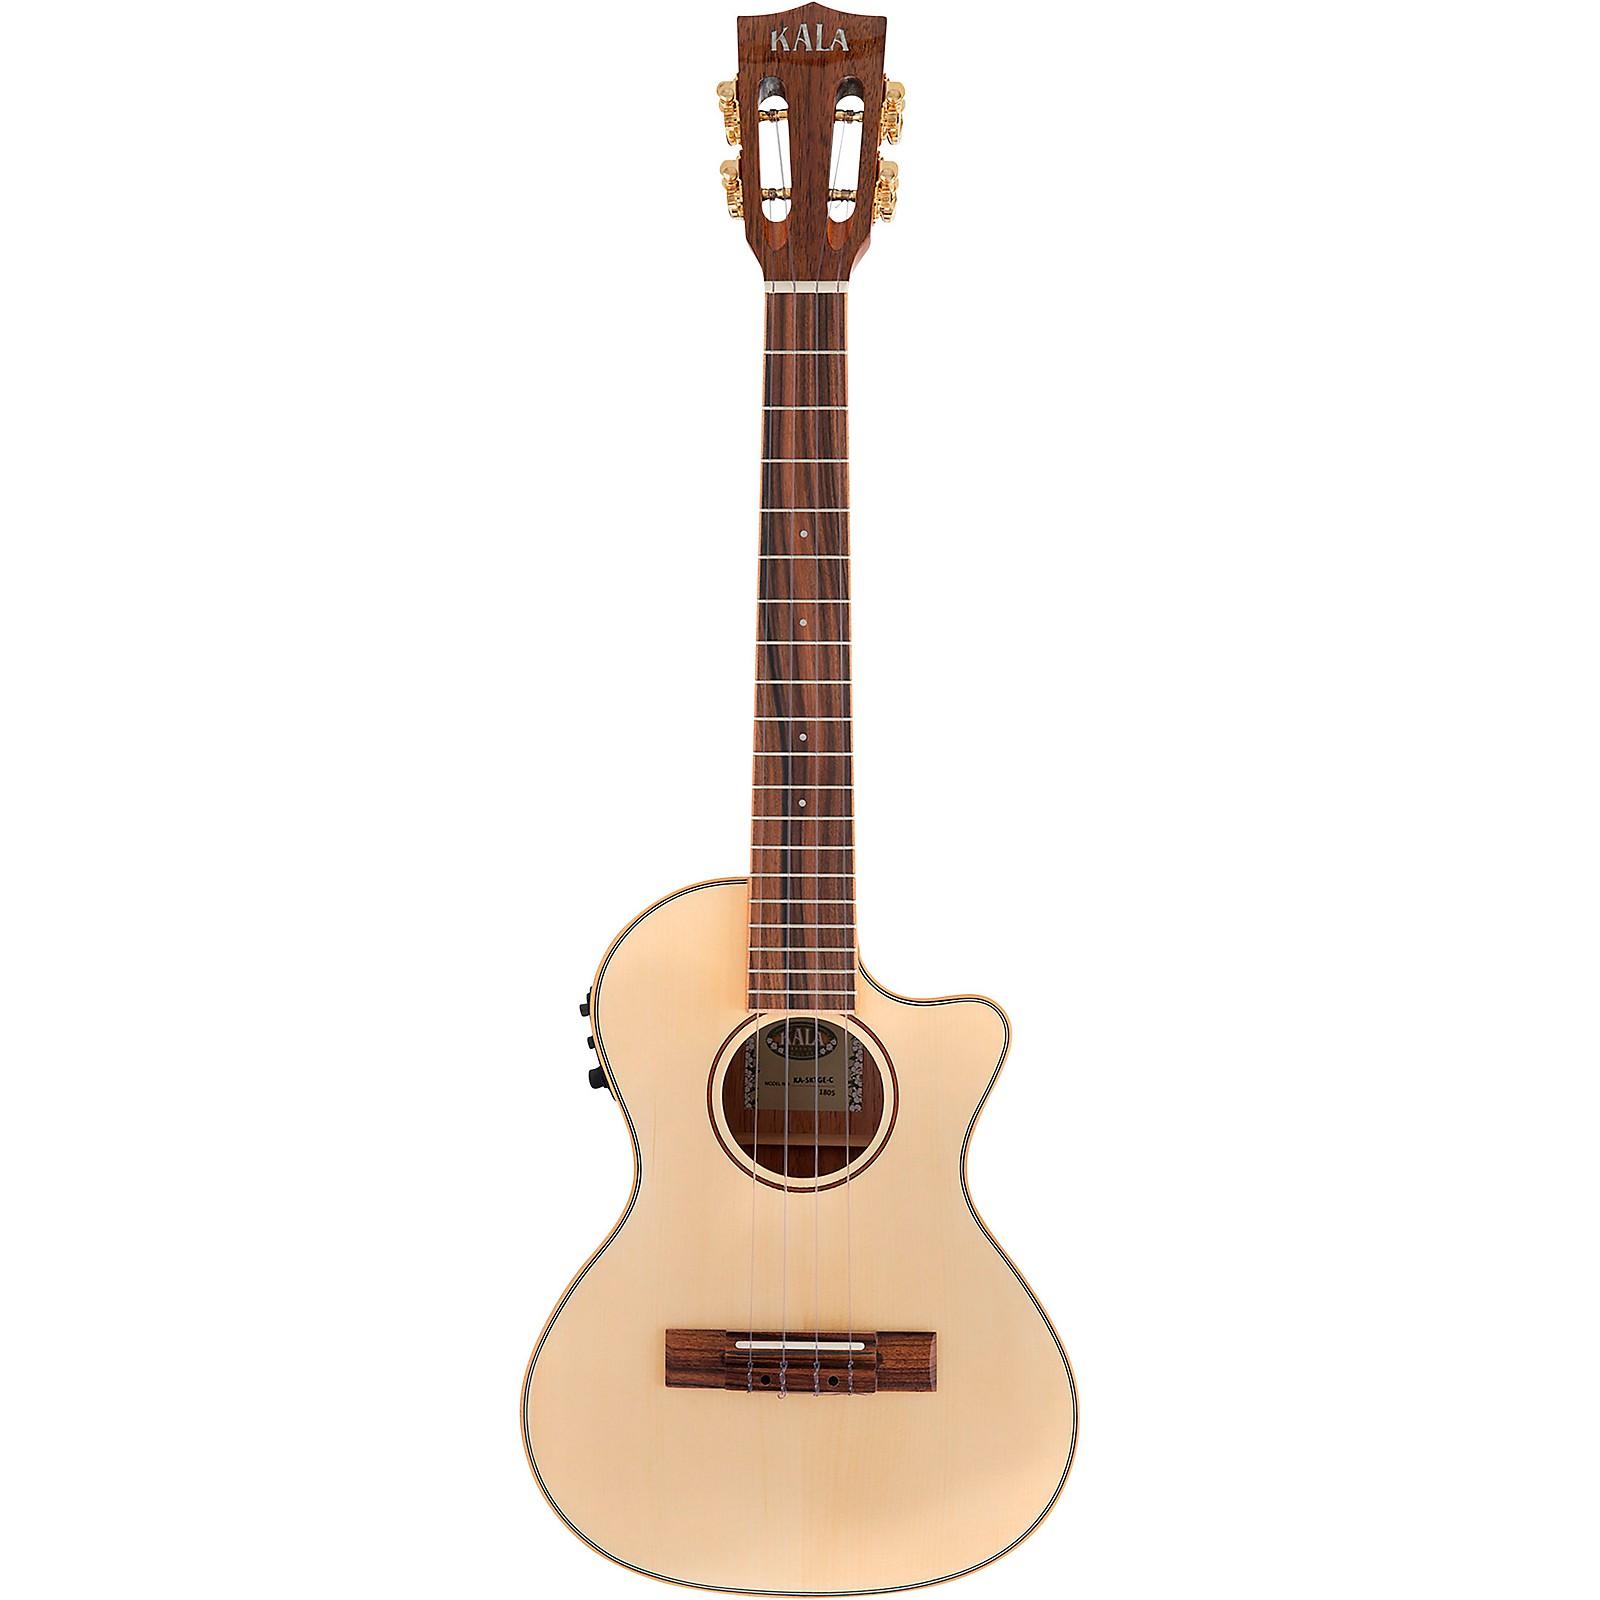 Open Box Kala Solid Spruce Top Koa Gloss Cutaway Acoustic-Electric Tenor Ukulele